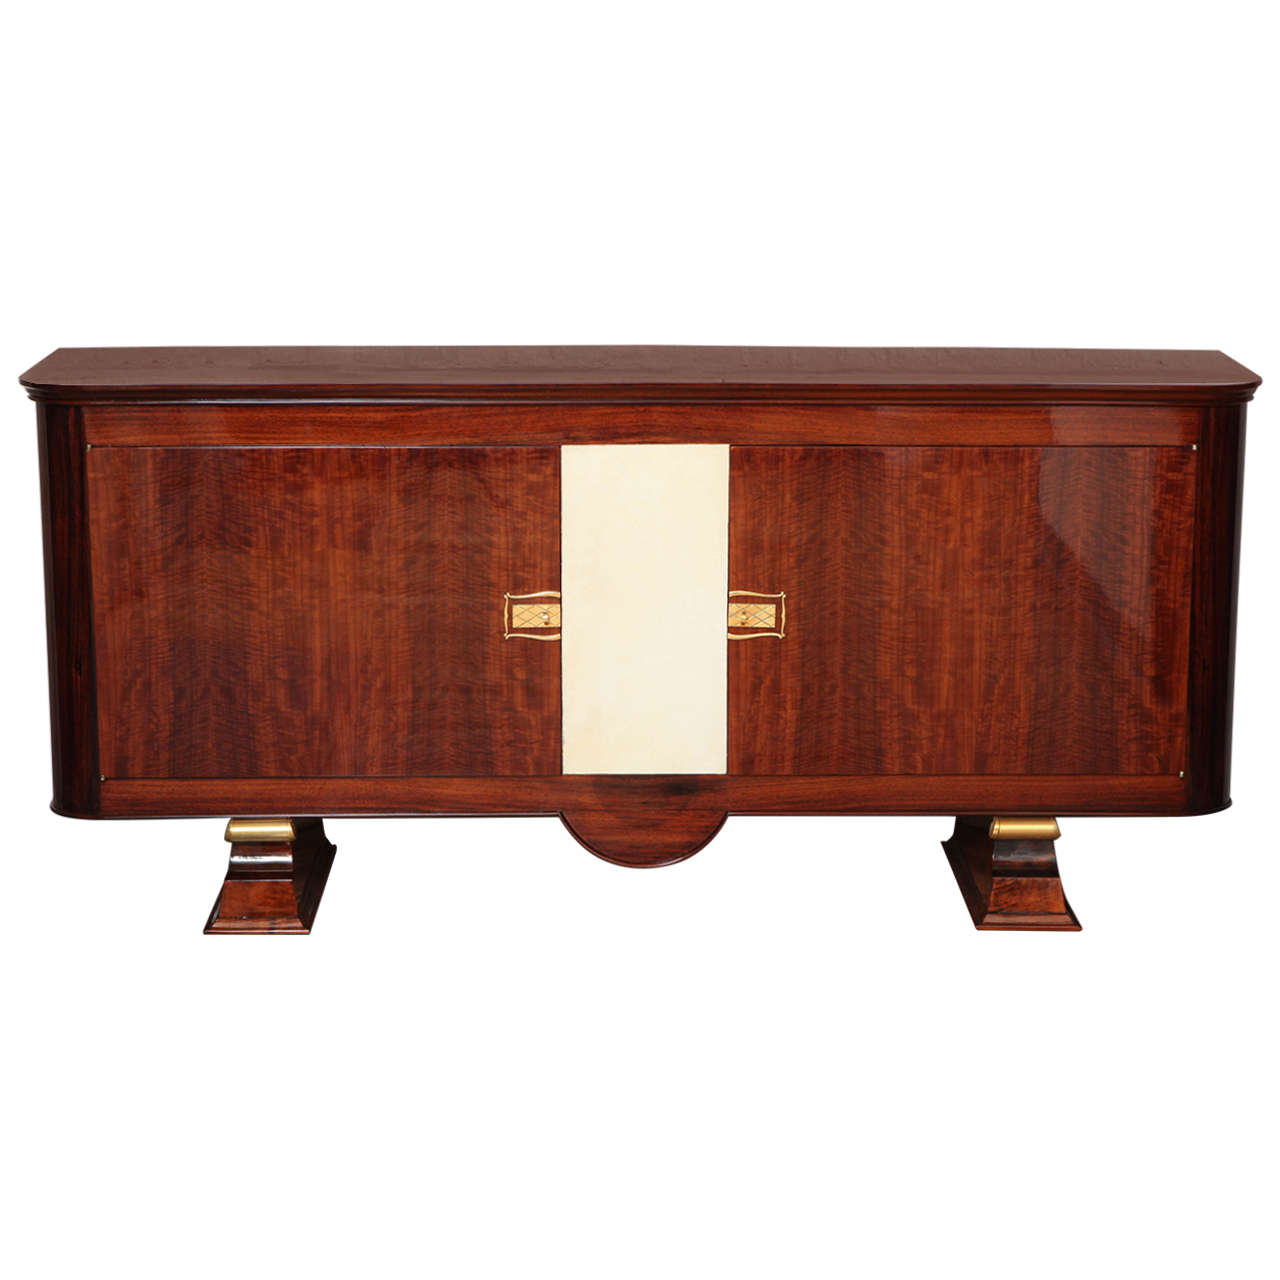 Art Deco Sideboard in Walnut with Parchment Center Door 1